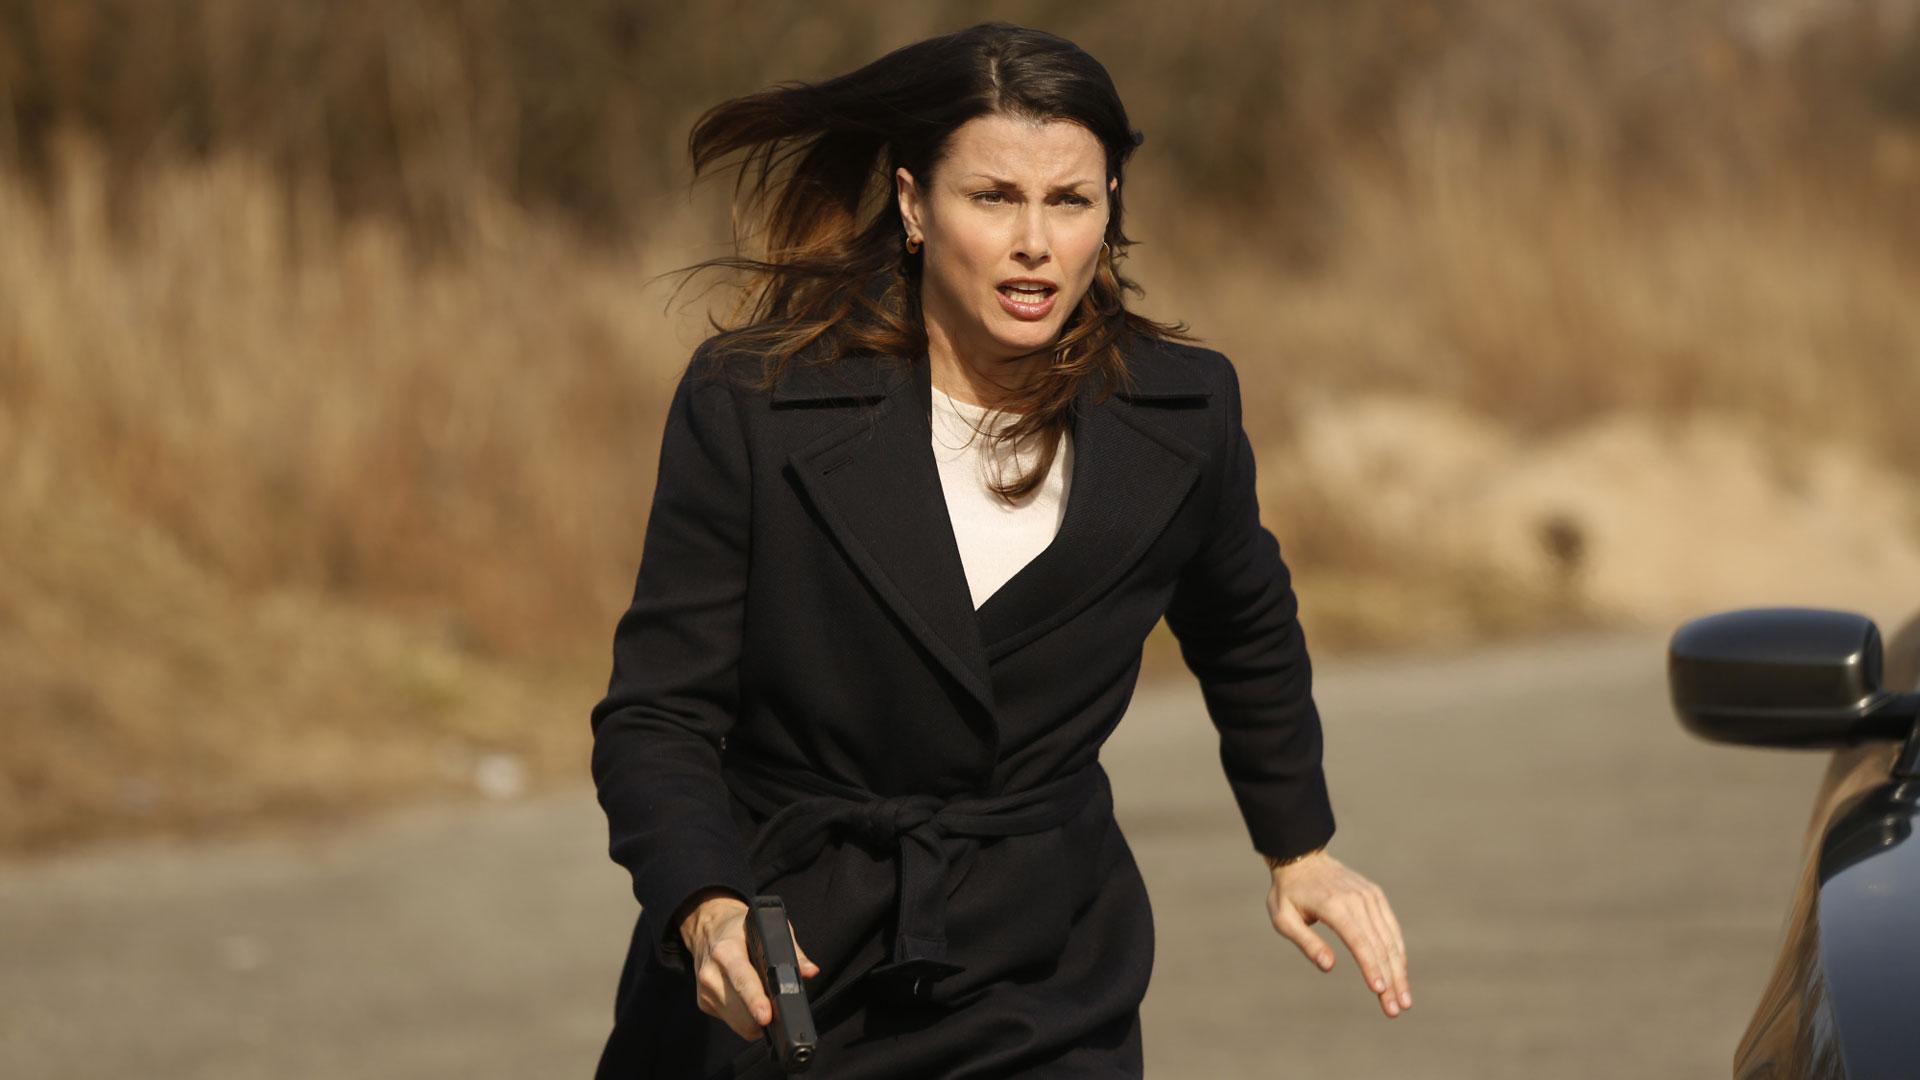 Erin Reagan rushes onto the scene.